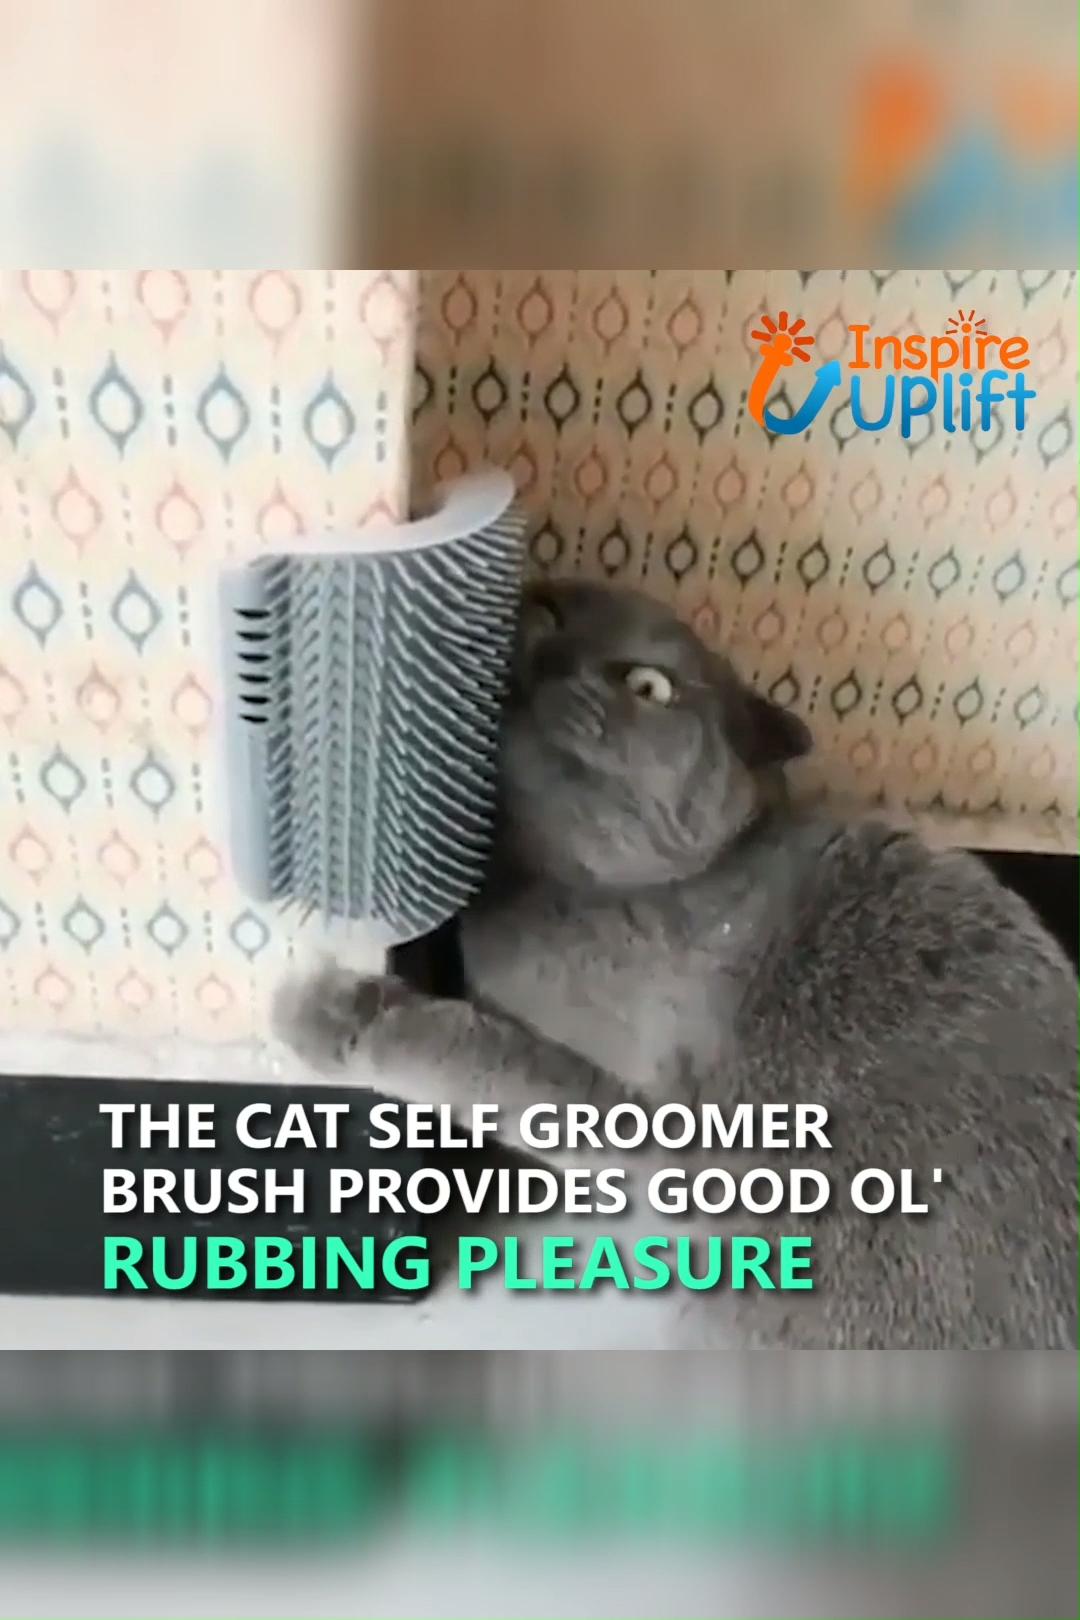 Cat Self Groomer Brush 😍 The Cat Self Groomer Brush